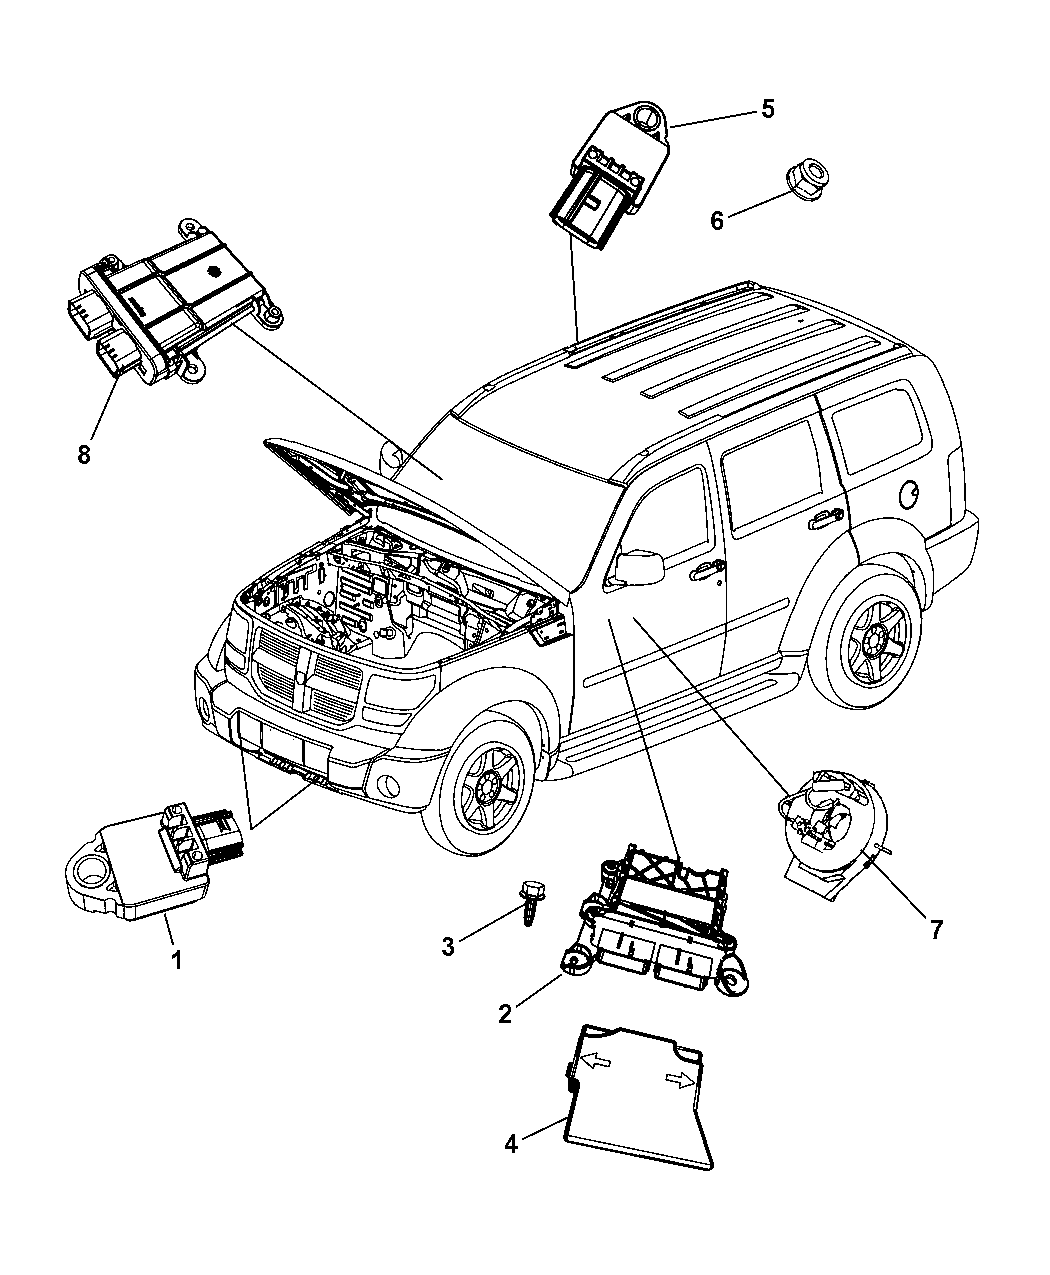 2011 Jeep Liberty Air Bag Modules Impact Sensor & Clock